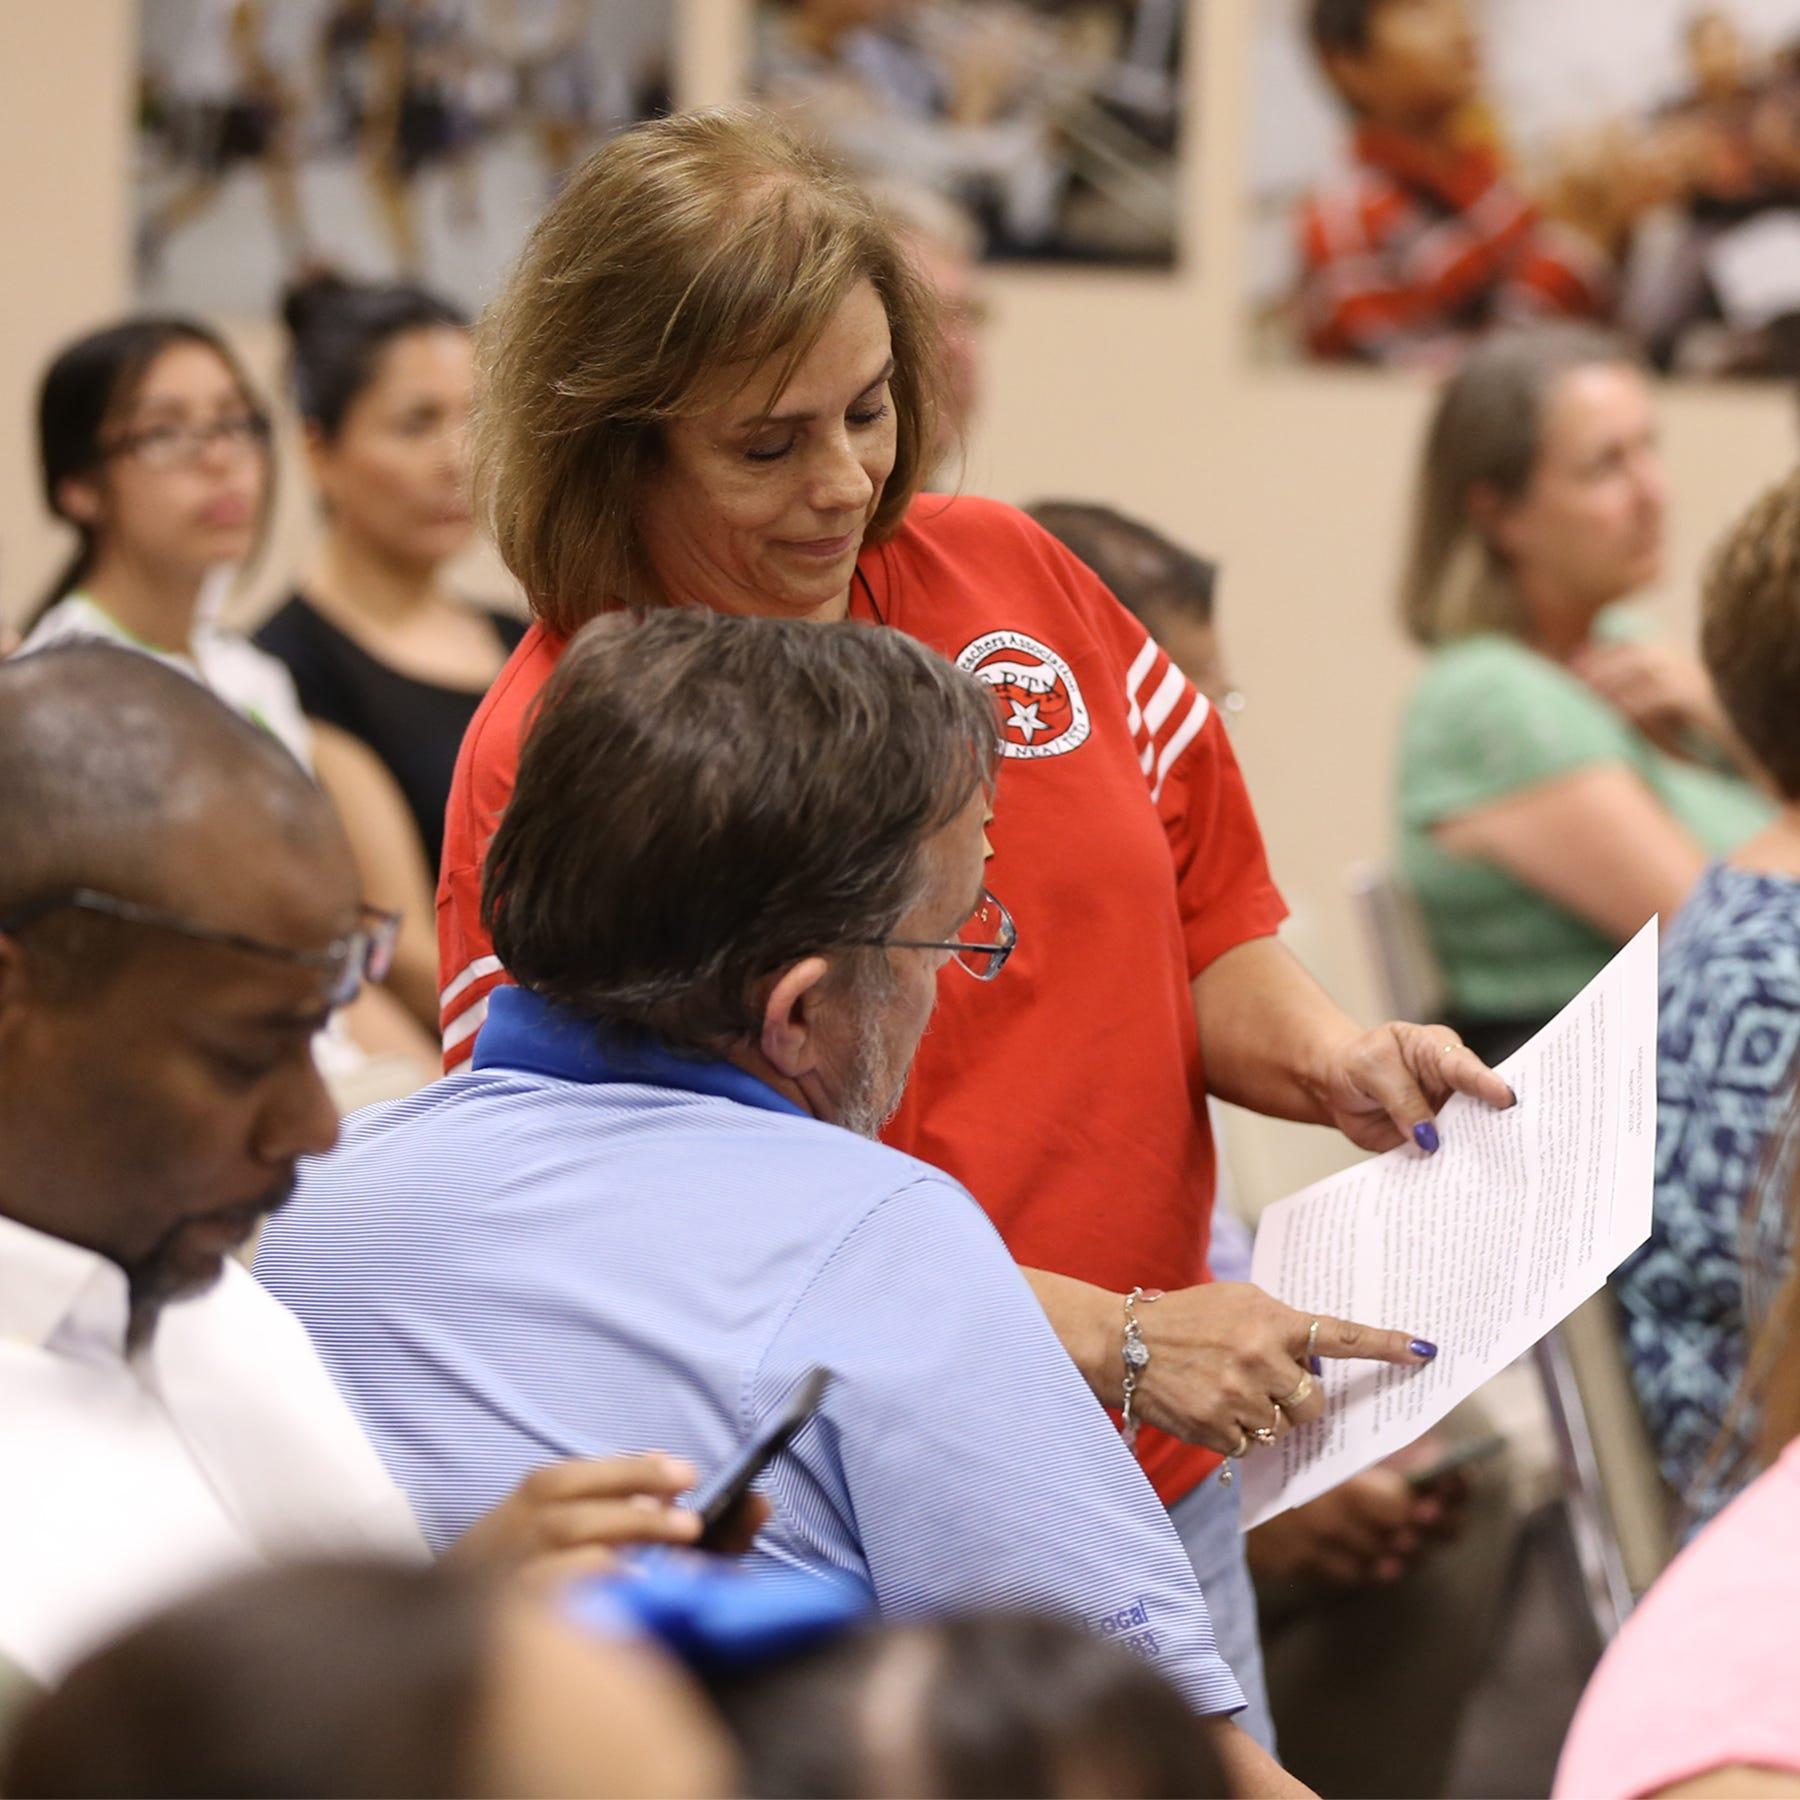 No raises, but EPISD teachers will get $750 bonus if voters approve 'penny swap'